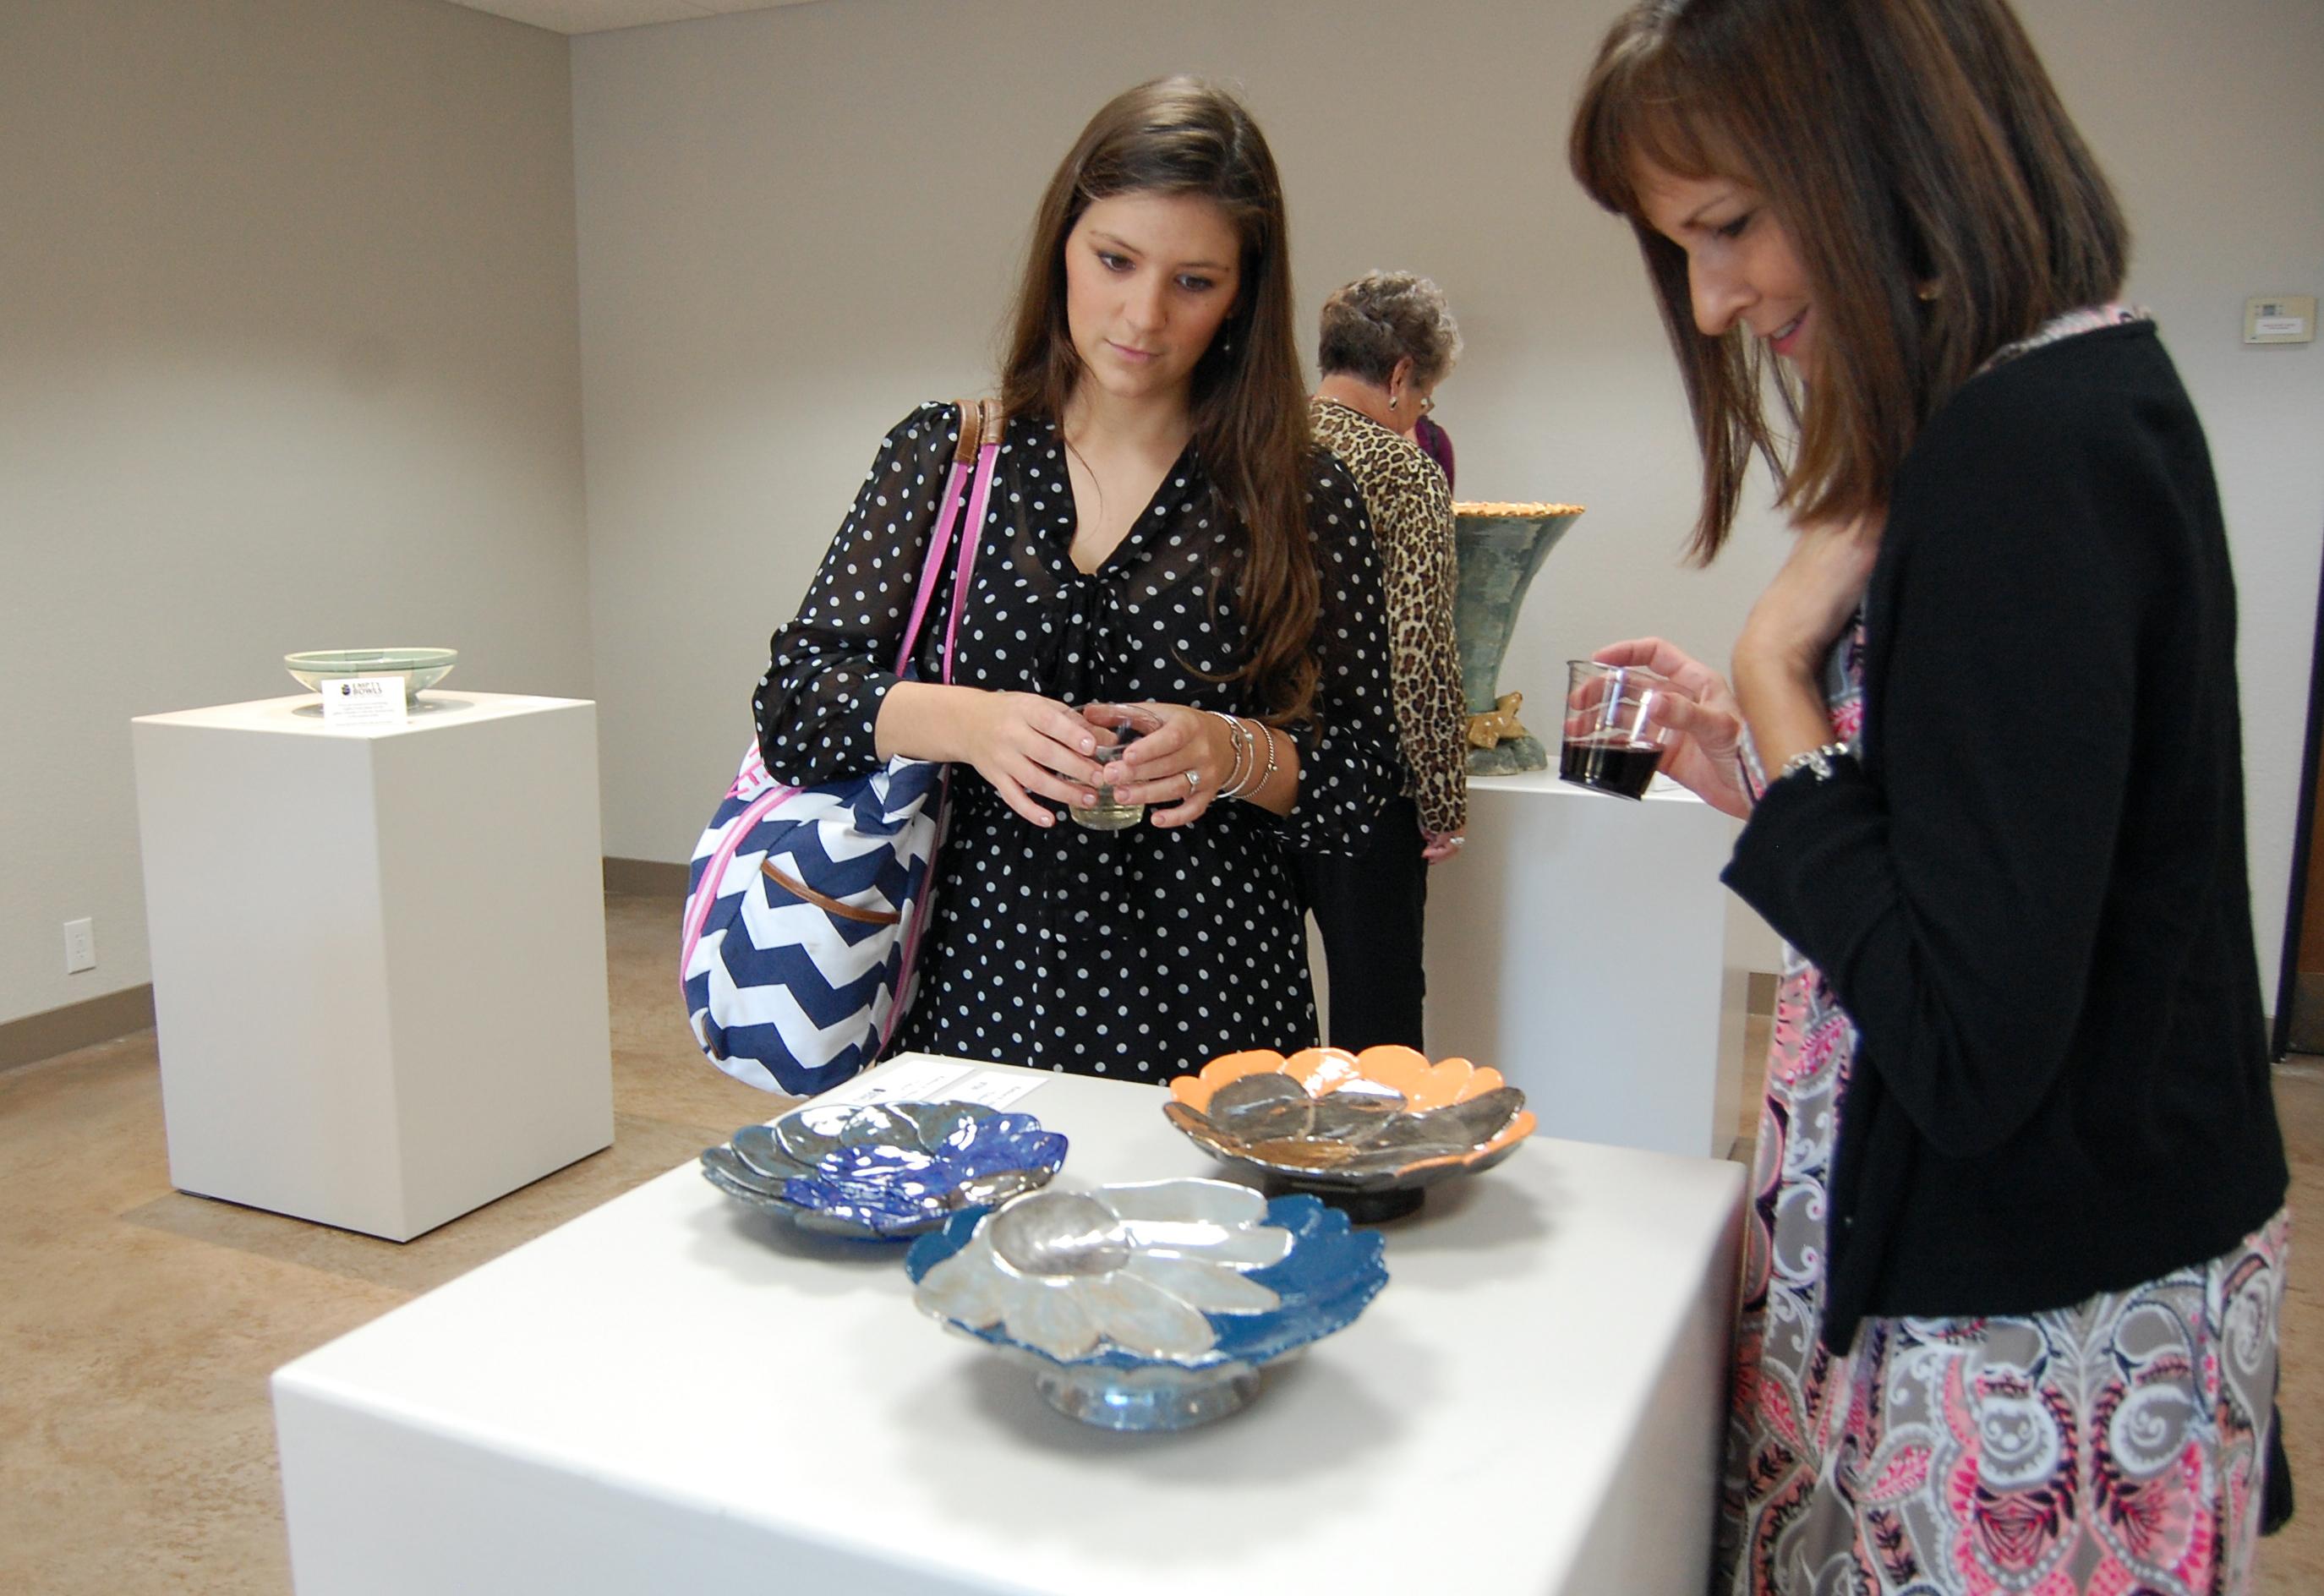 Empty Bowls program raises funds for needy